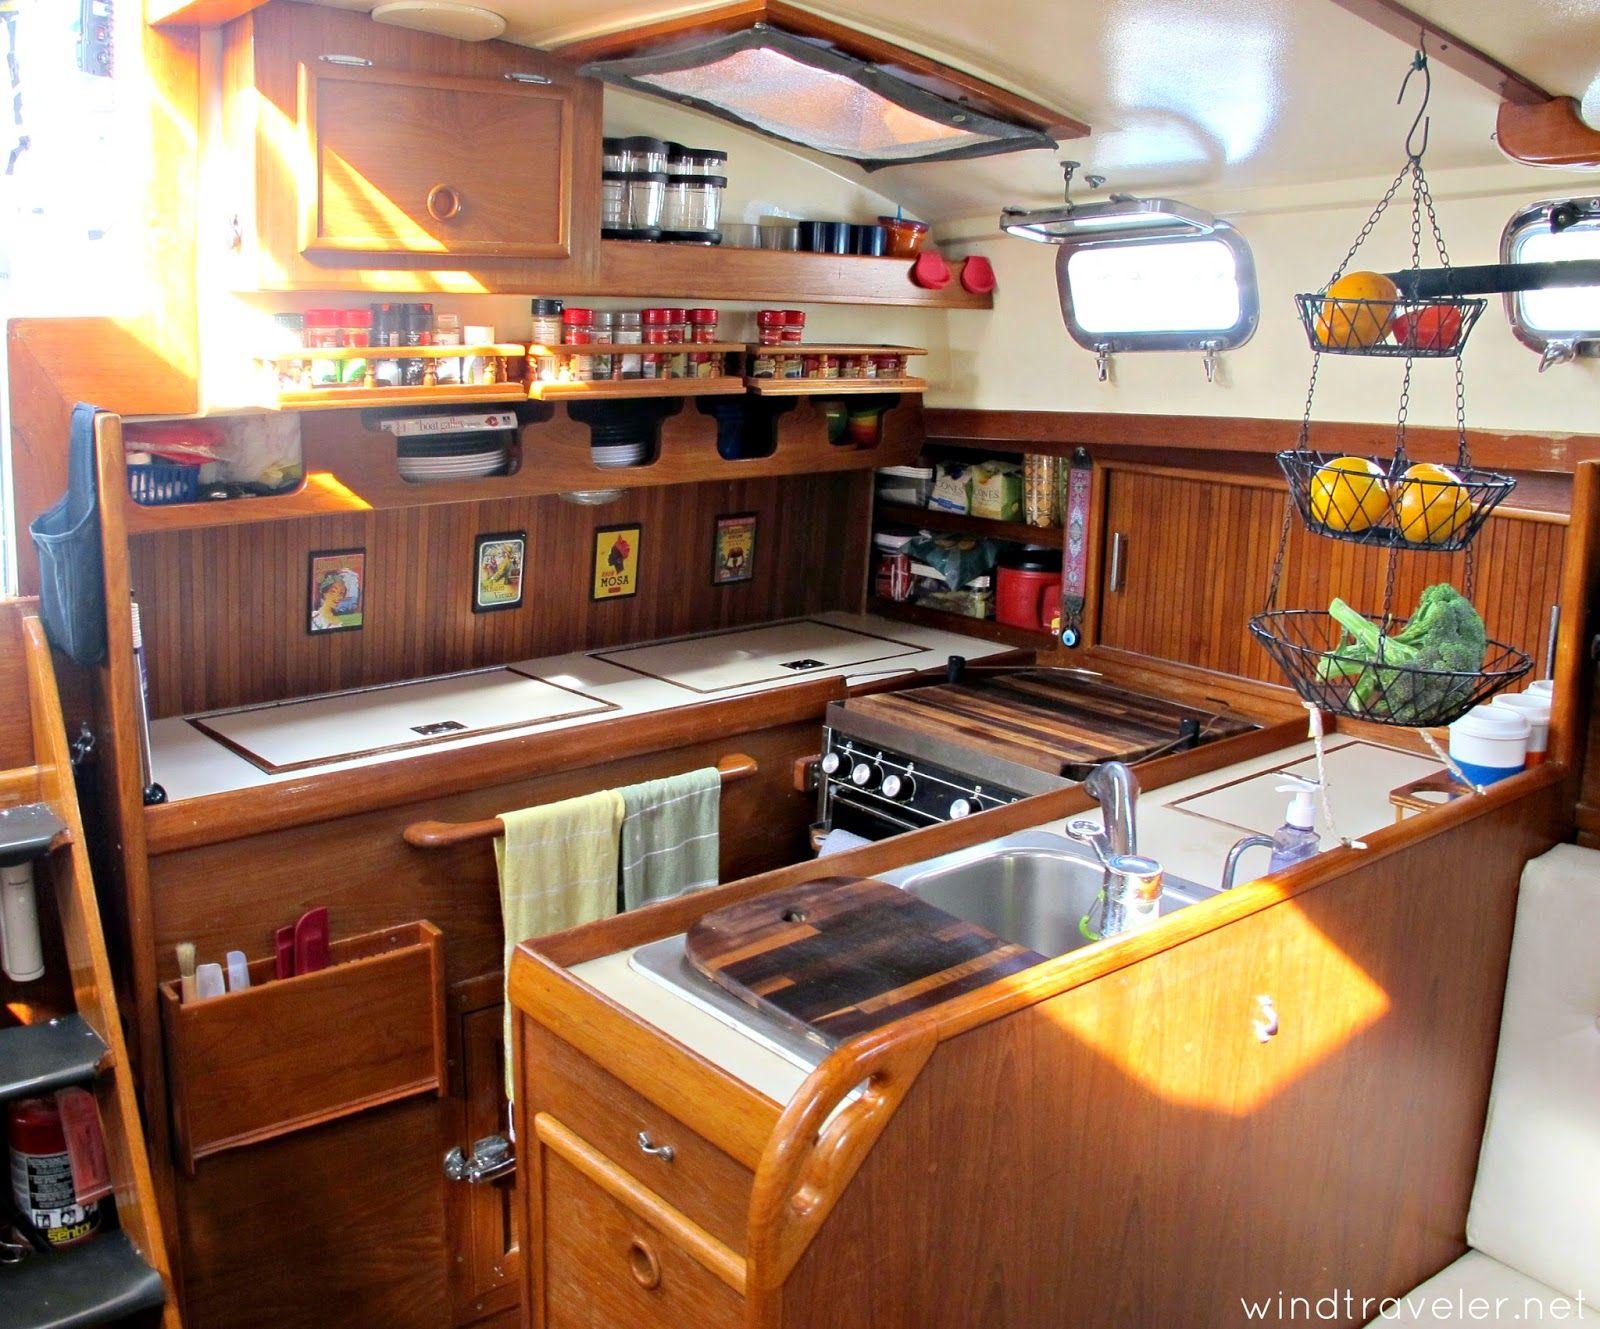 Windtraveler: Windtraveler: Our Boat Interior: A Photo Tour